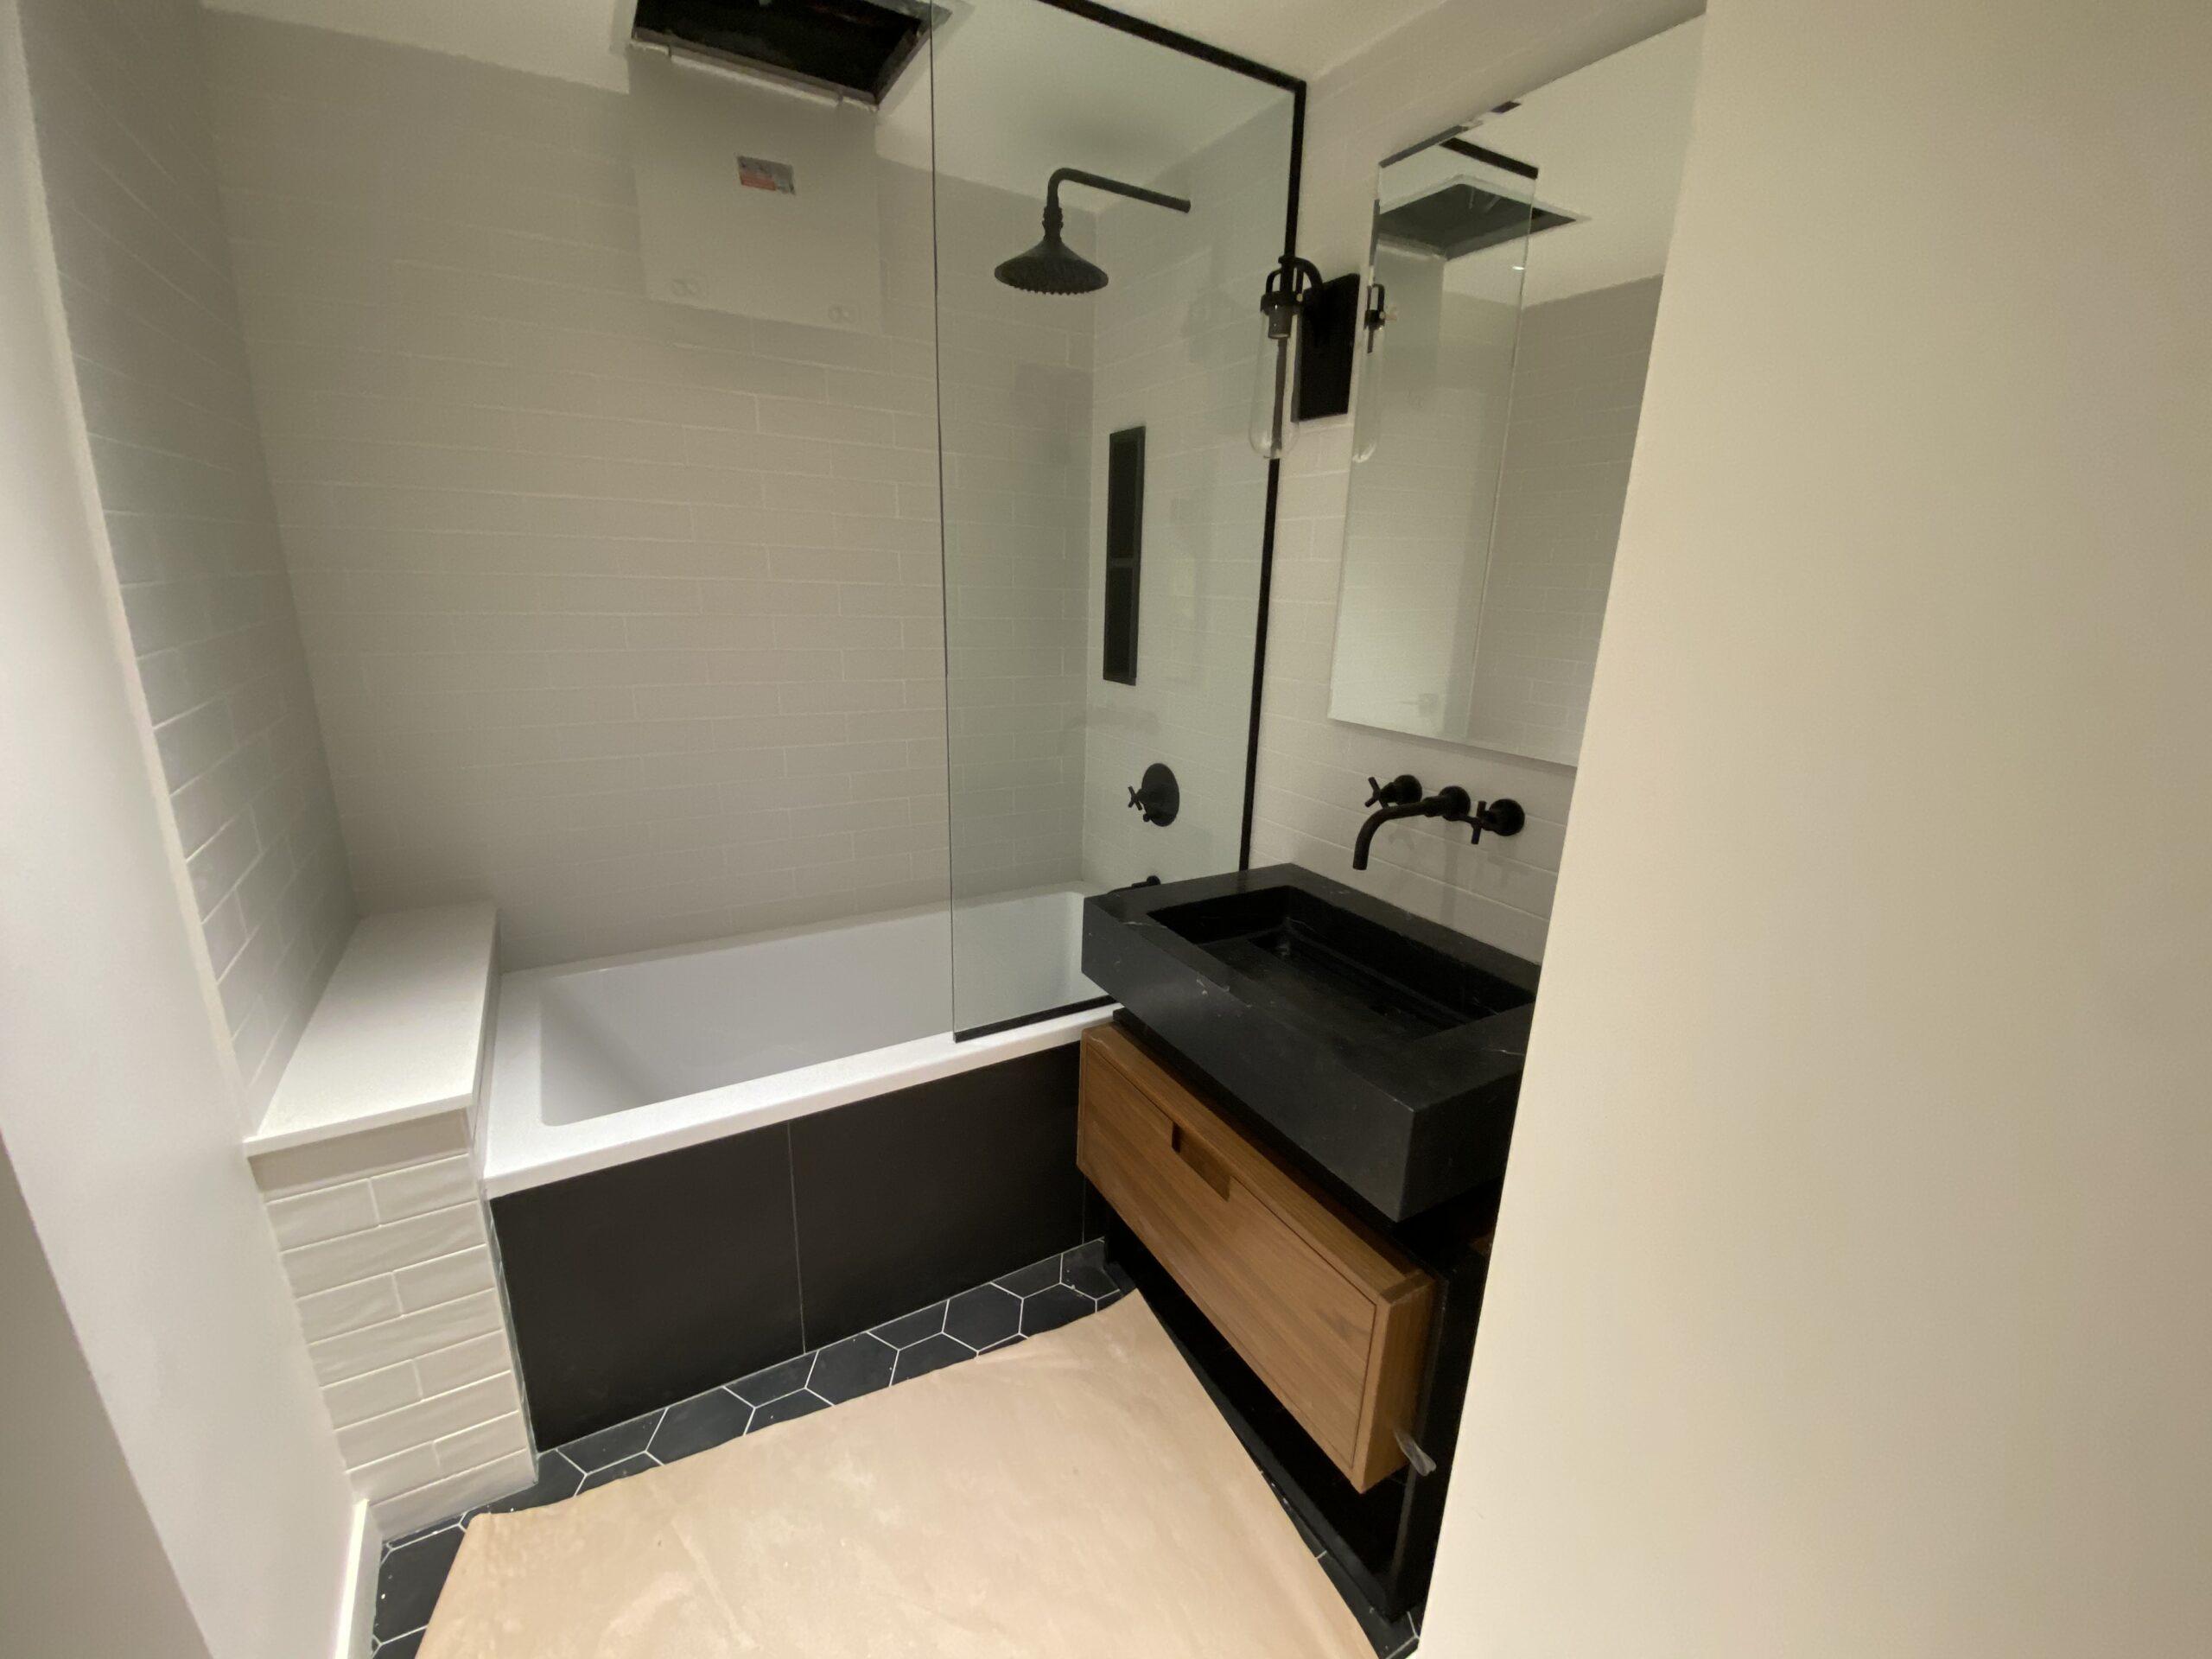 33 Frost bathroom